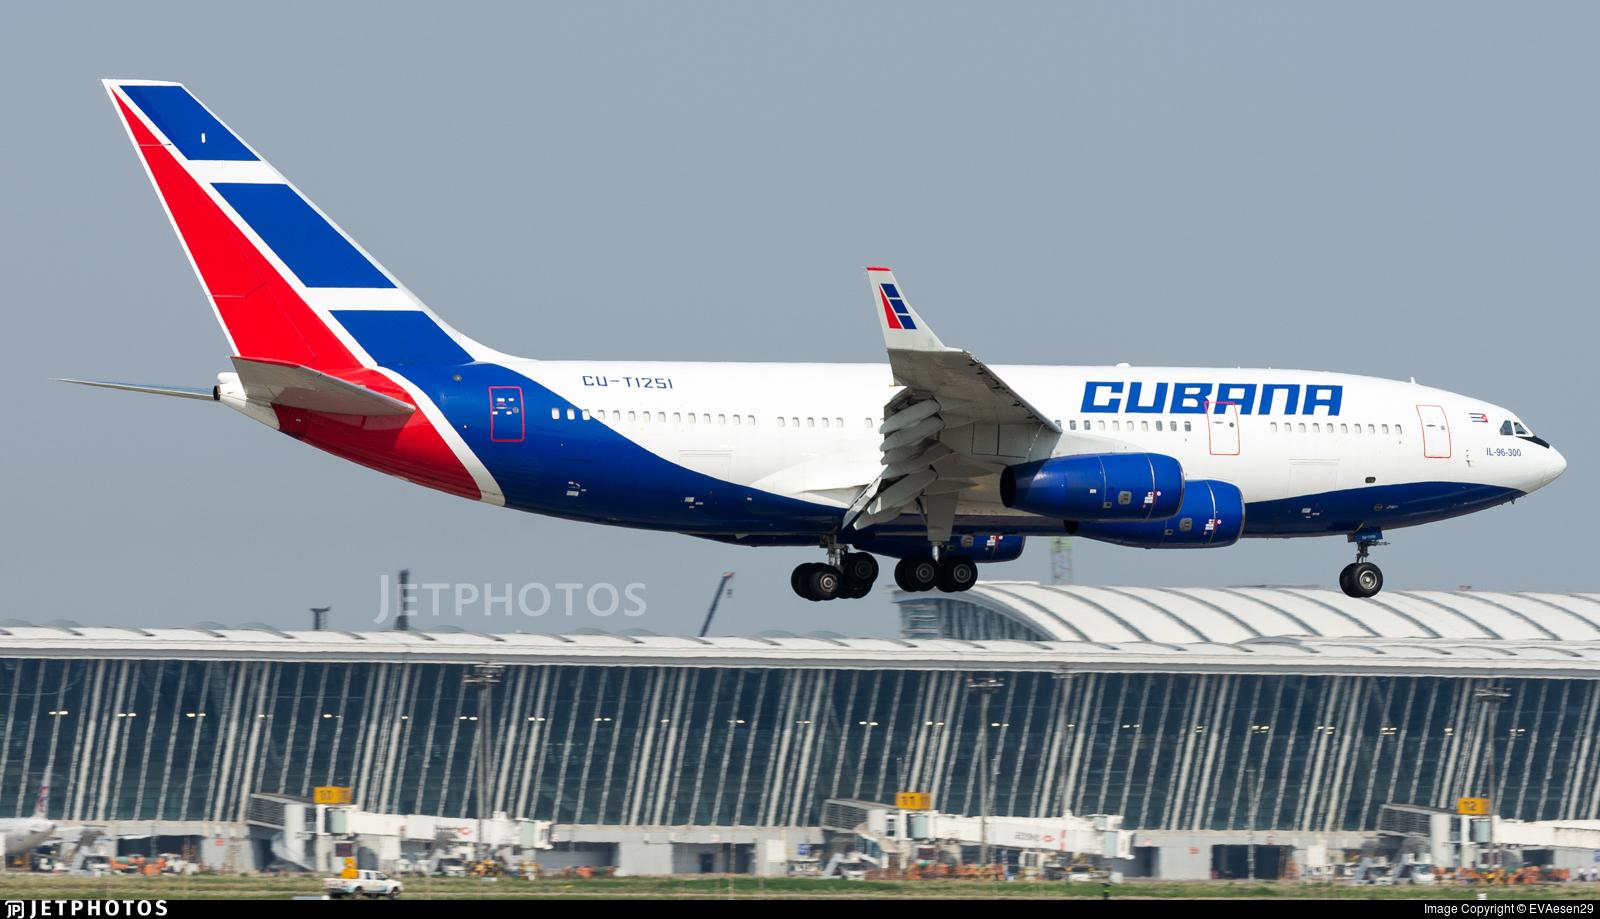 CU-T1251 - Ilyushin IL-96-300M - Cubana de Aviación